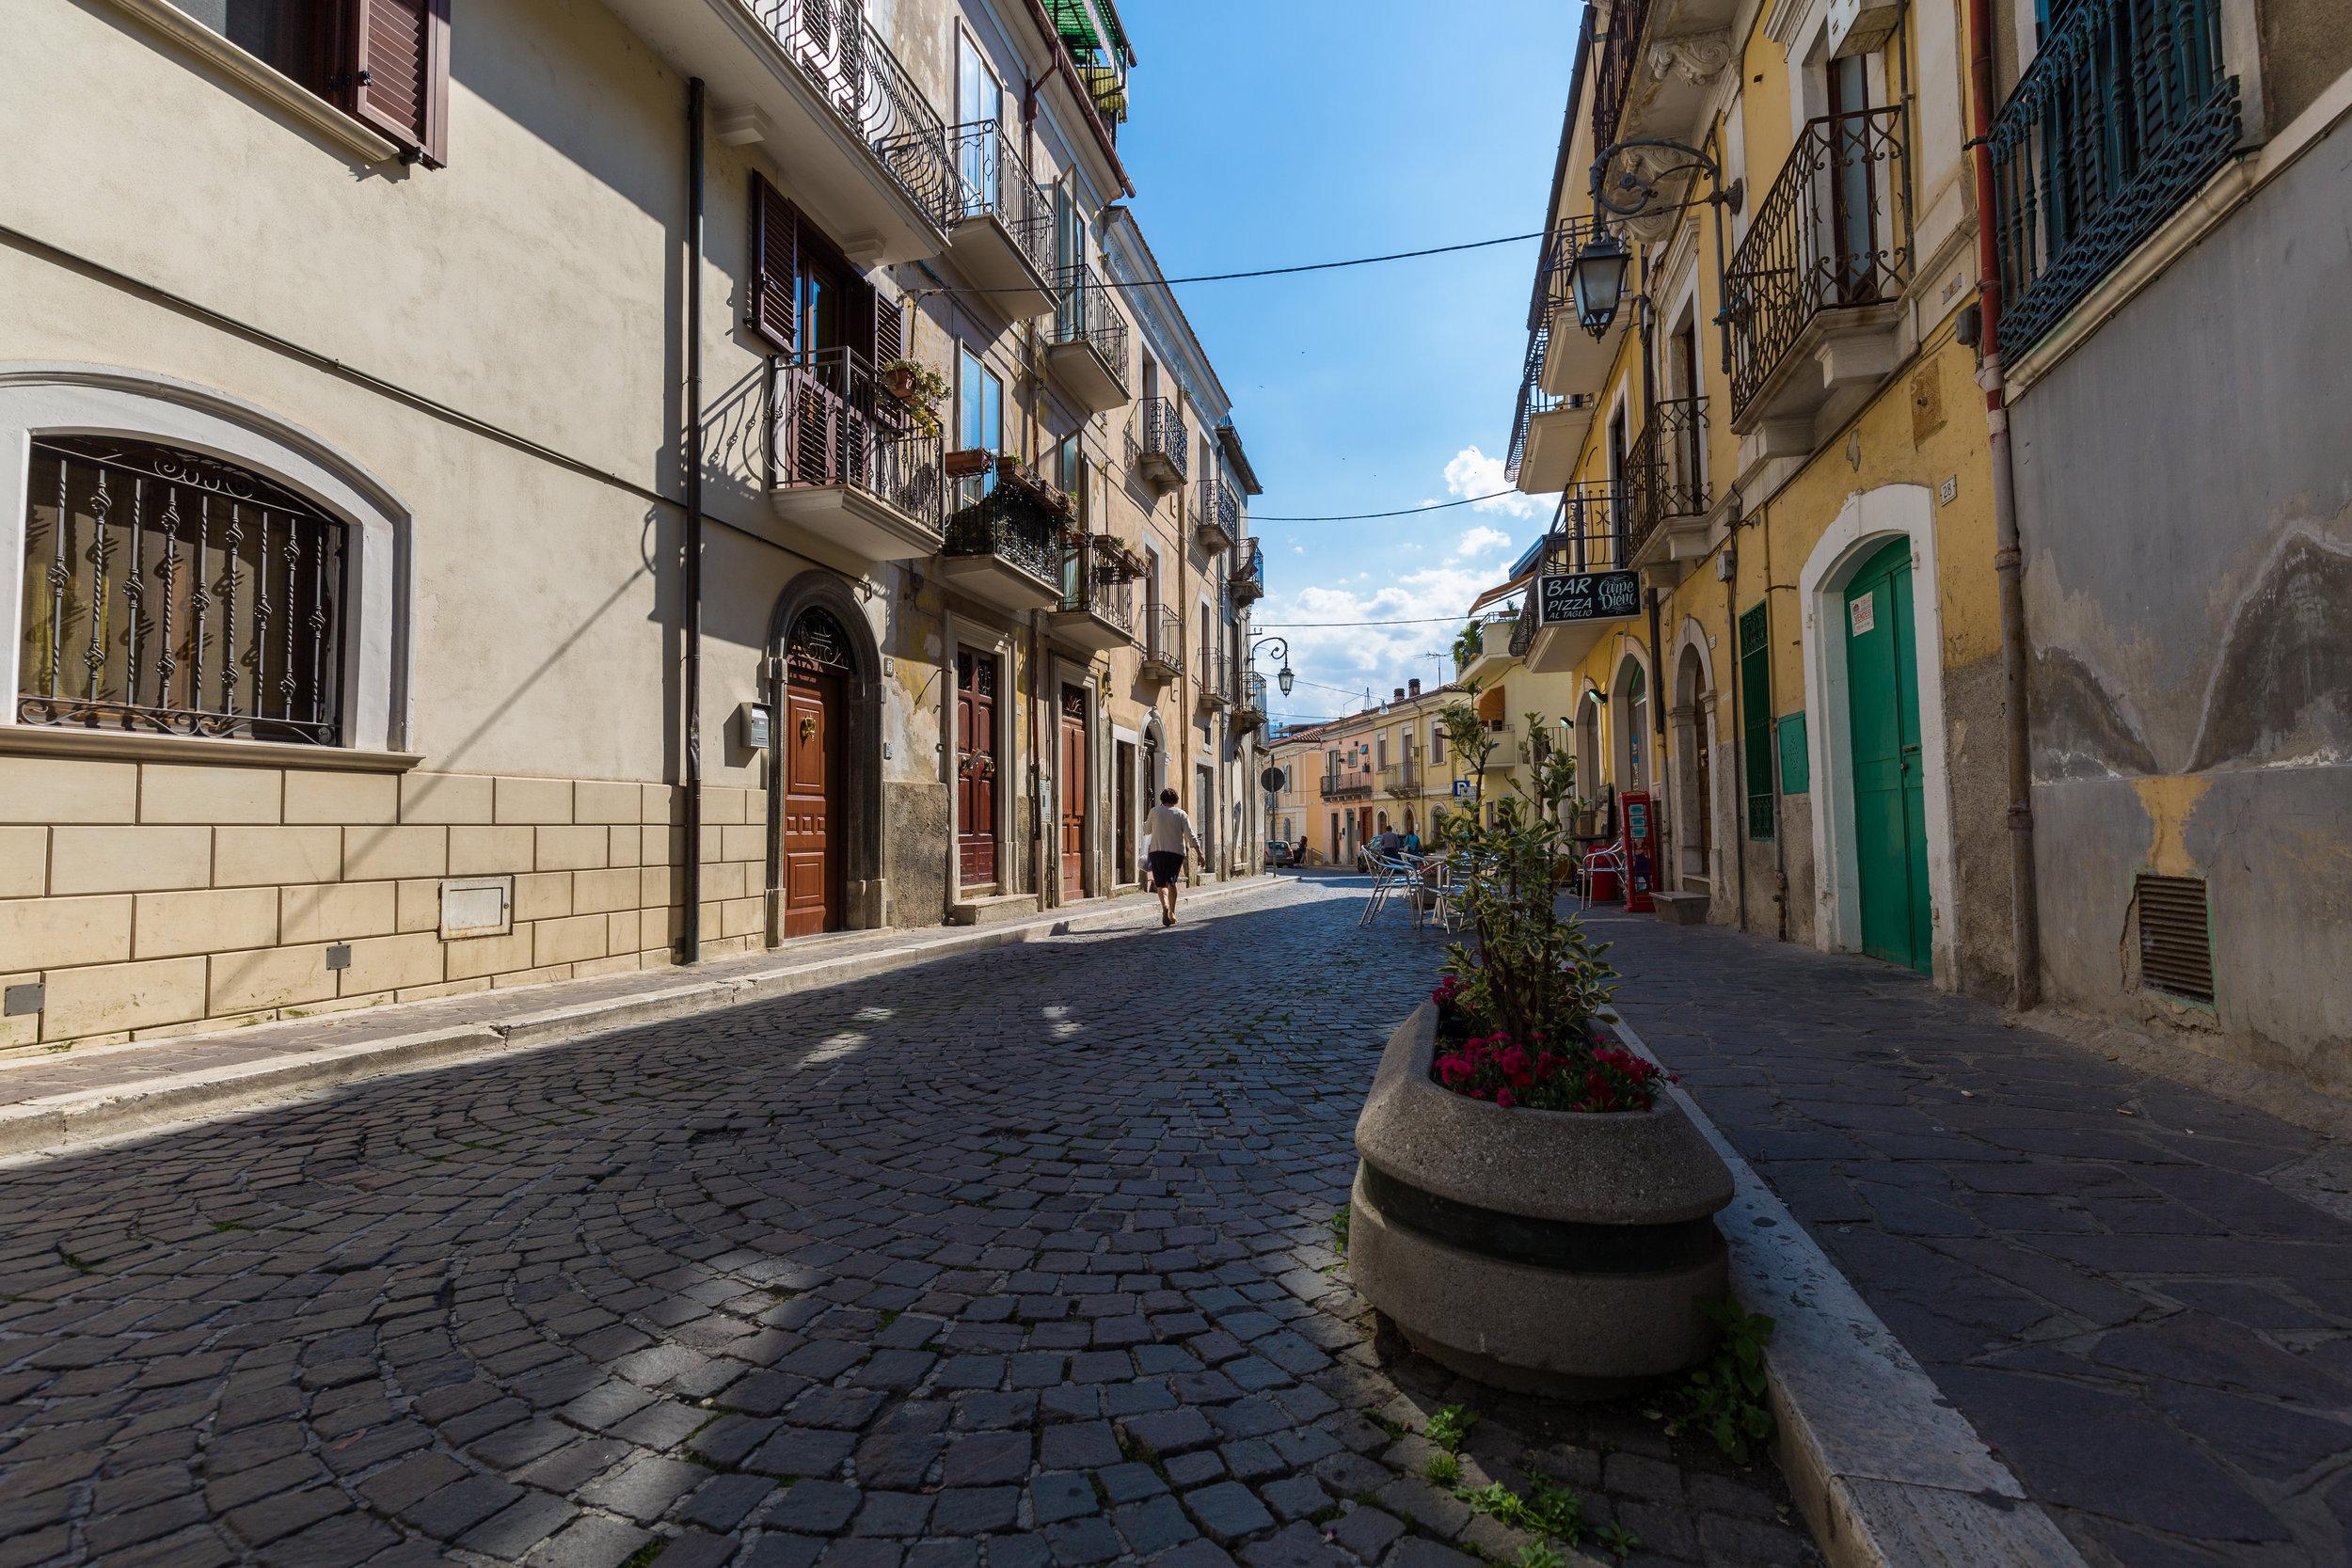 Pratola Peligna streets